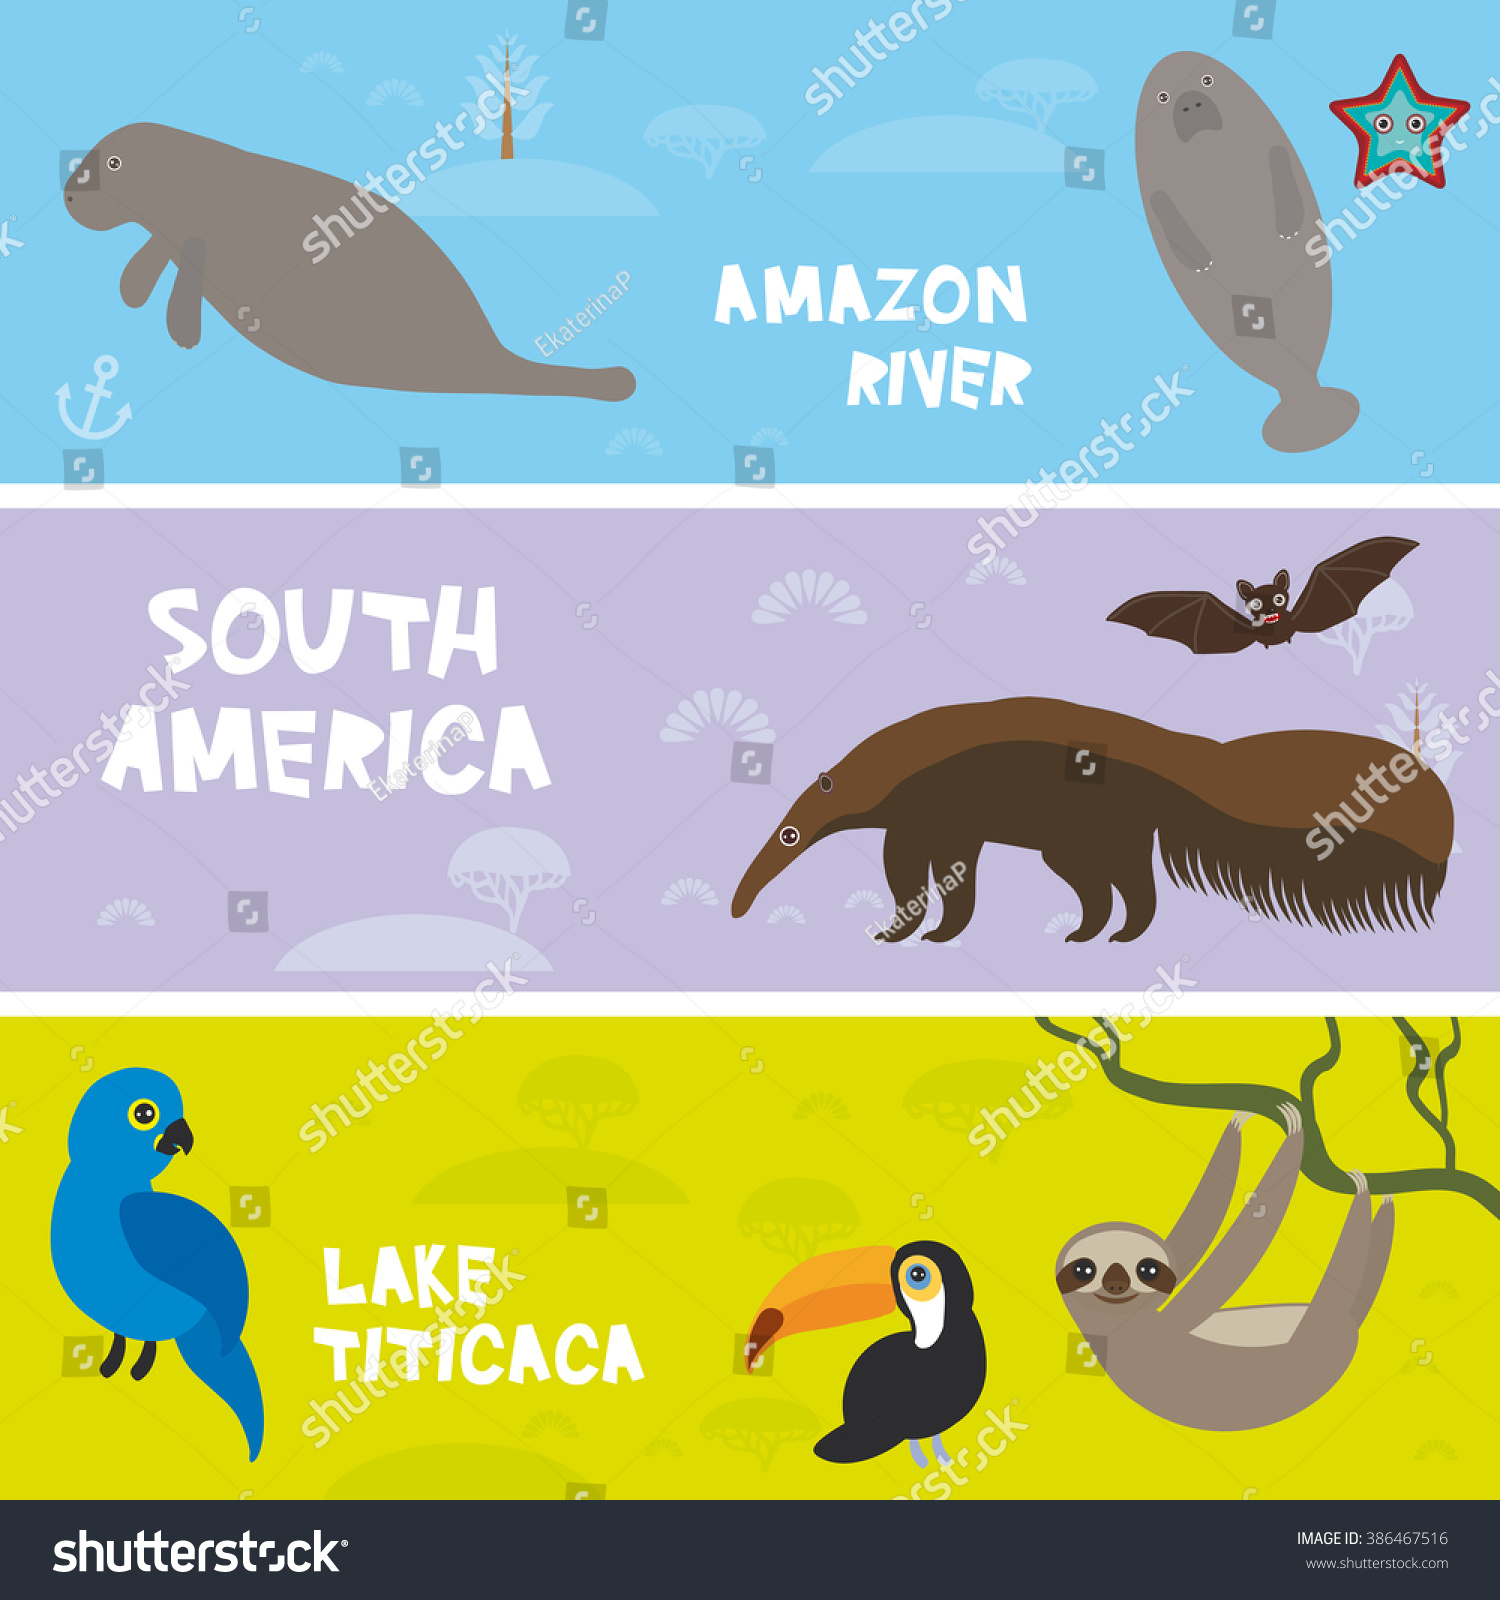 Sloth is a friendly animal